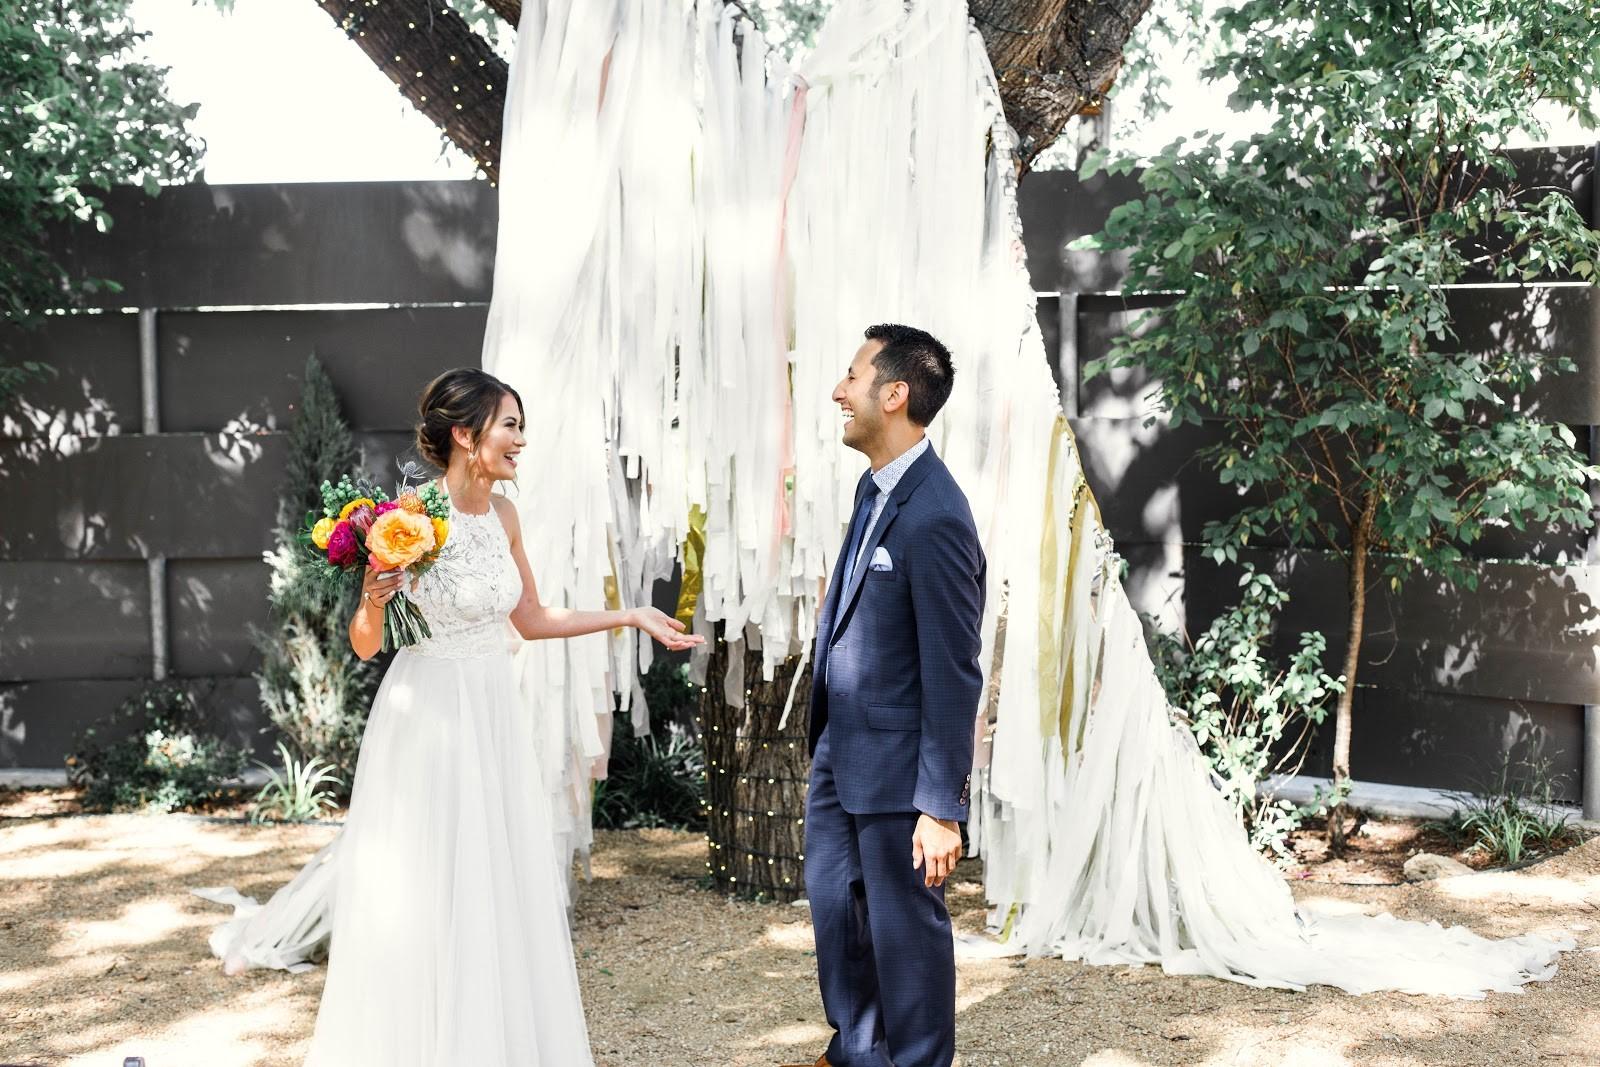 Pros & Cons: First Looks Versus Ceremony